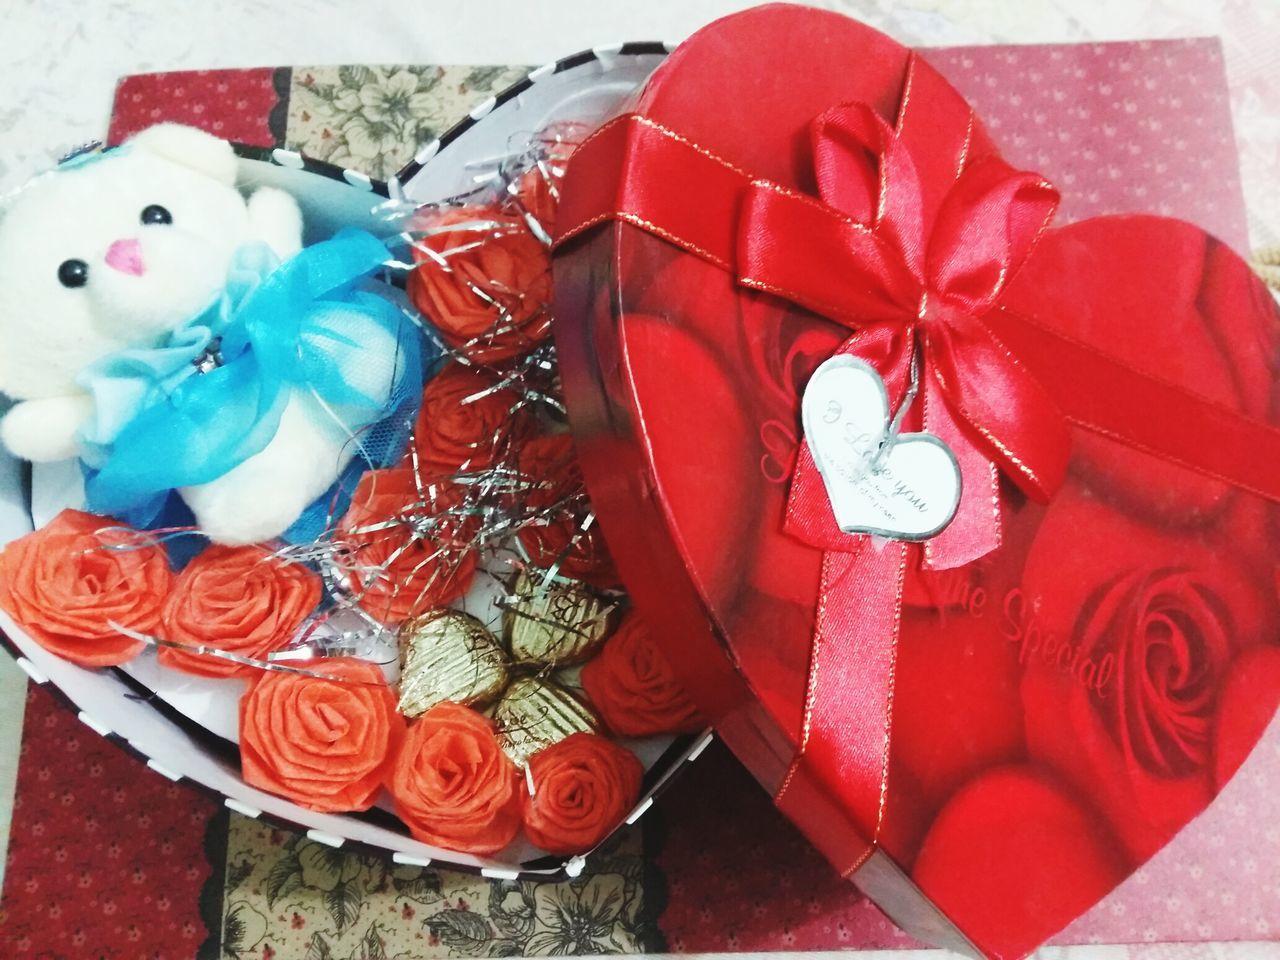 My Valentine Day Gift (: Chocolate Chip Cookies